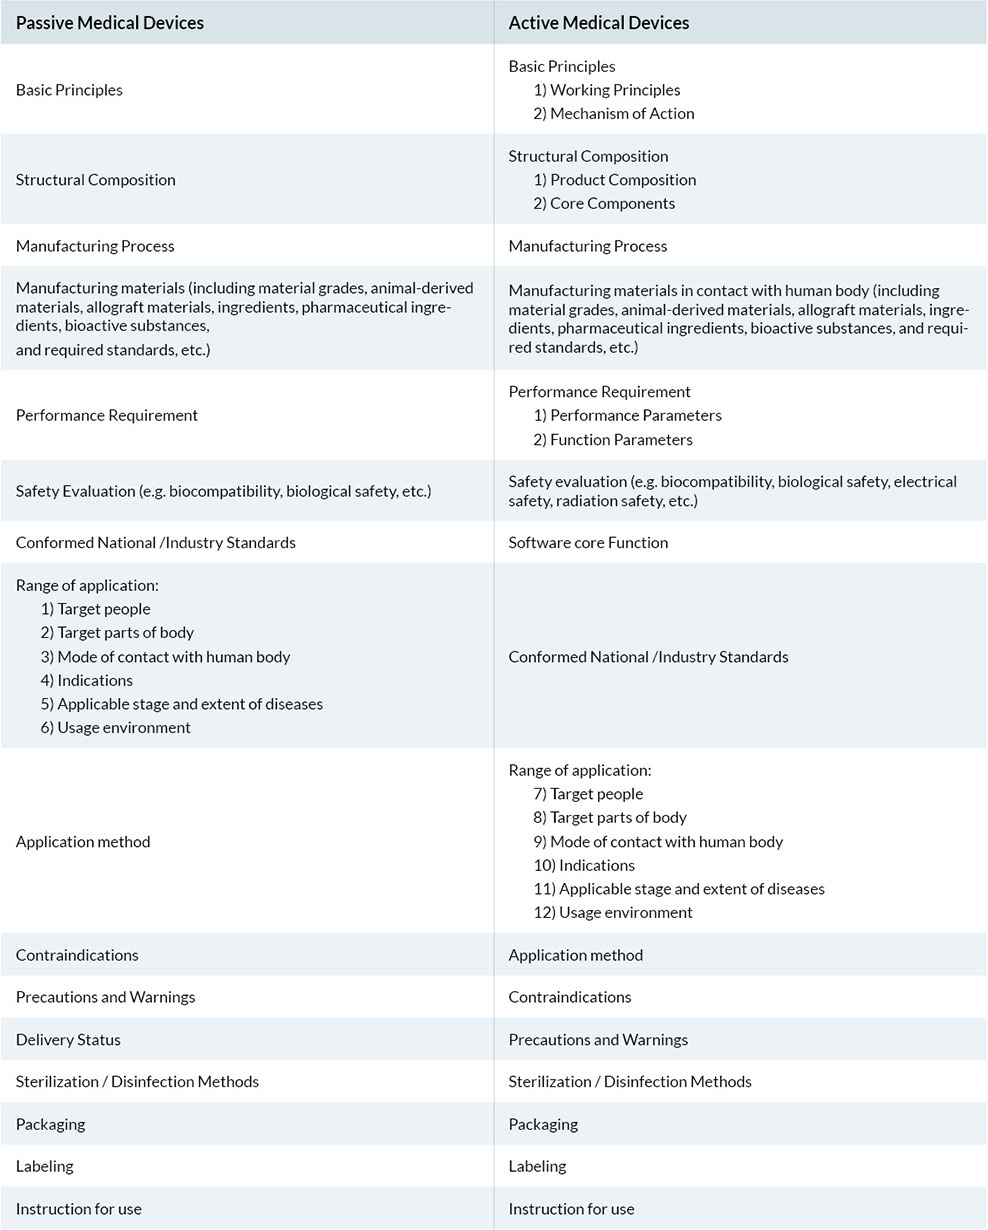 qtec Aktive vs. Passive Medizinprodukte